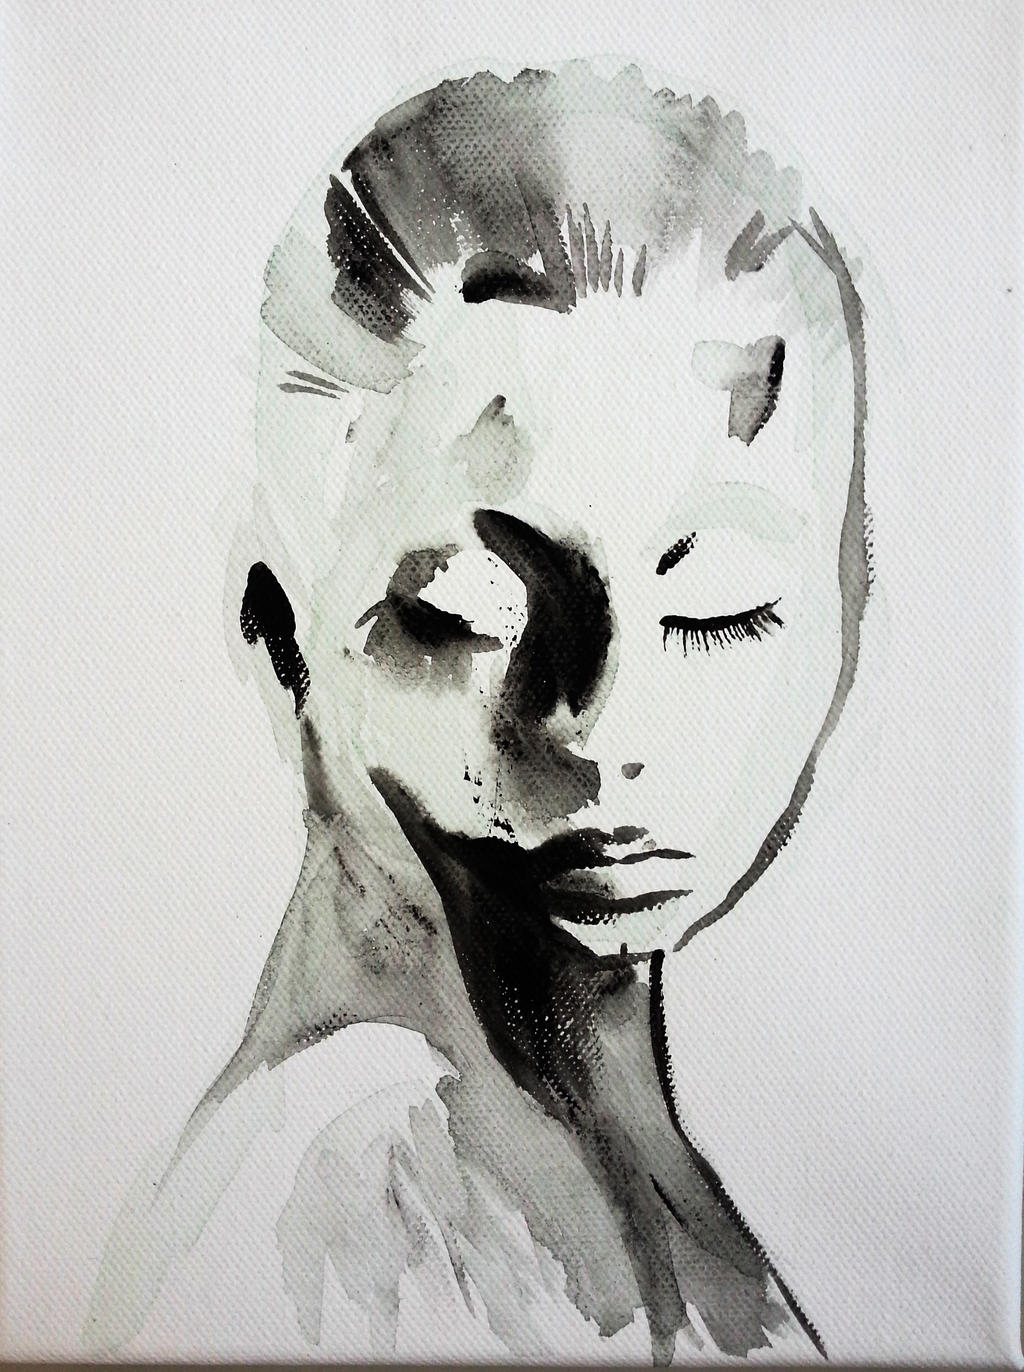 A Hint of sadness by dareme